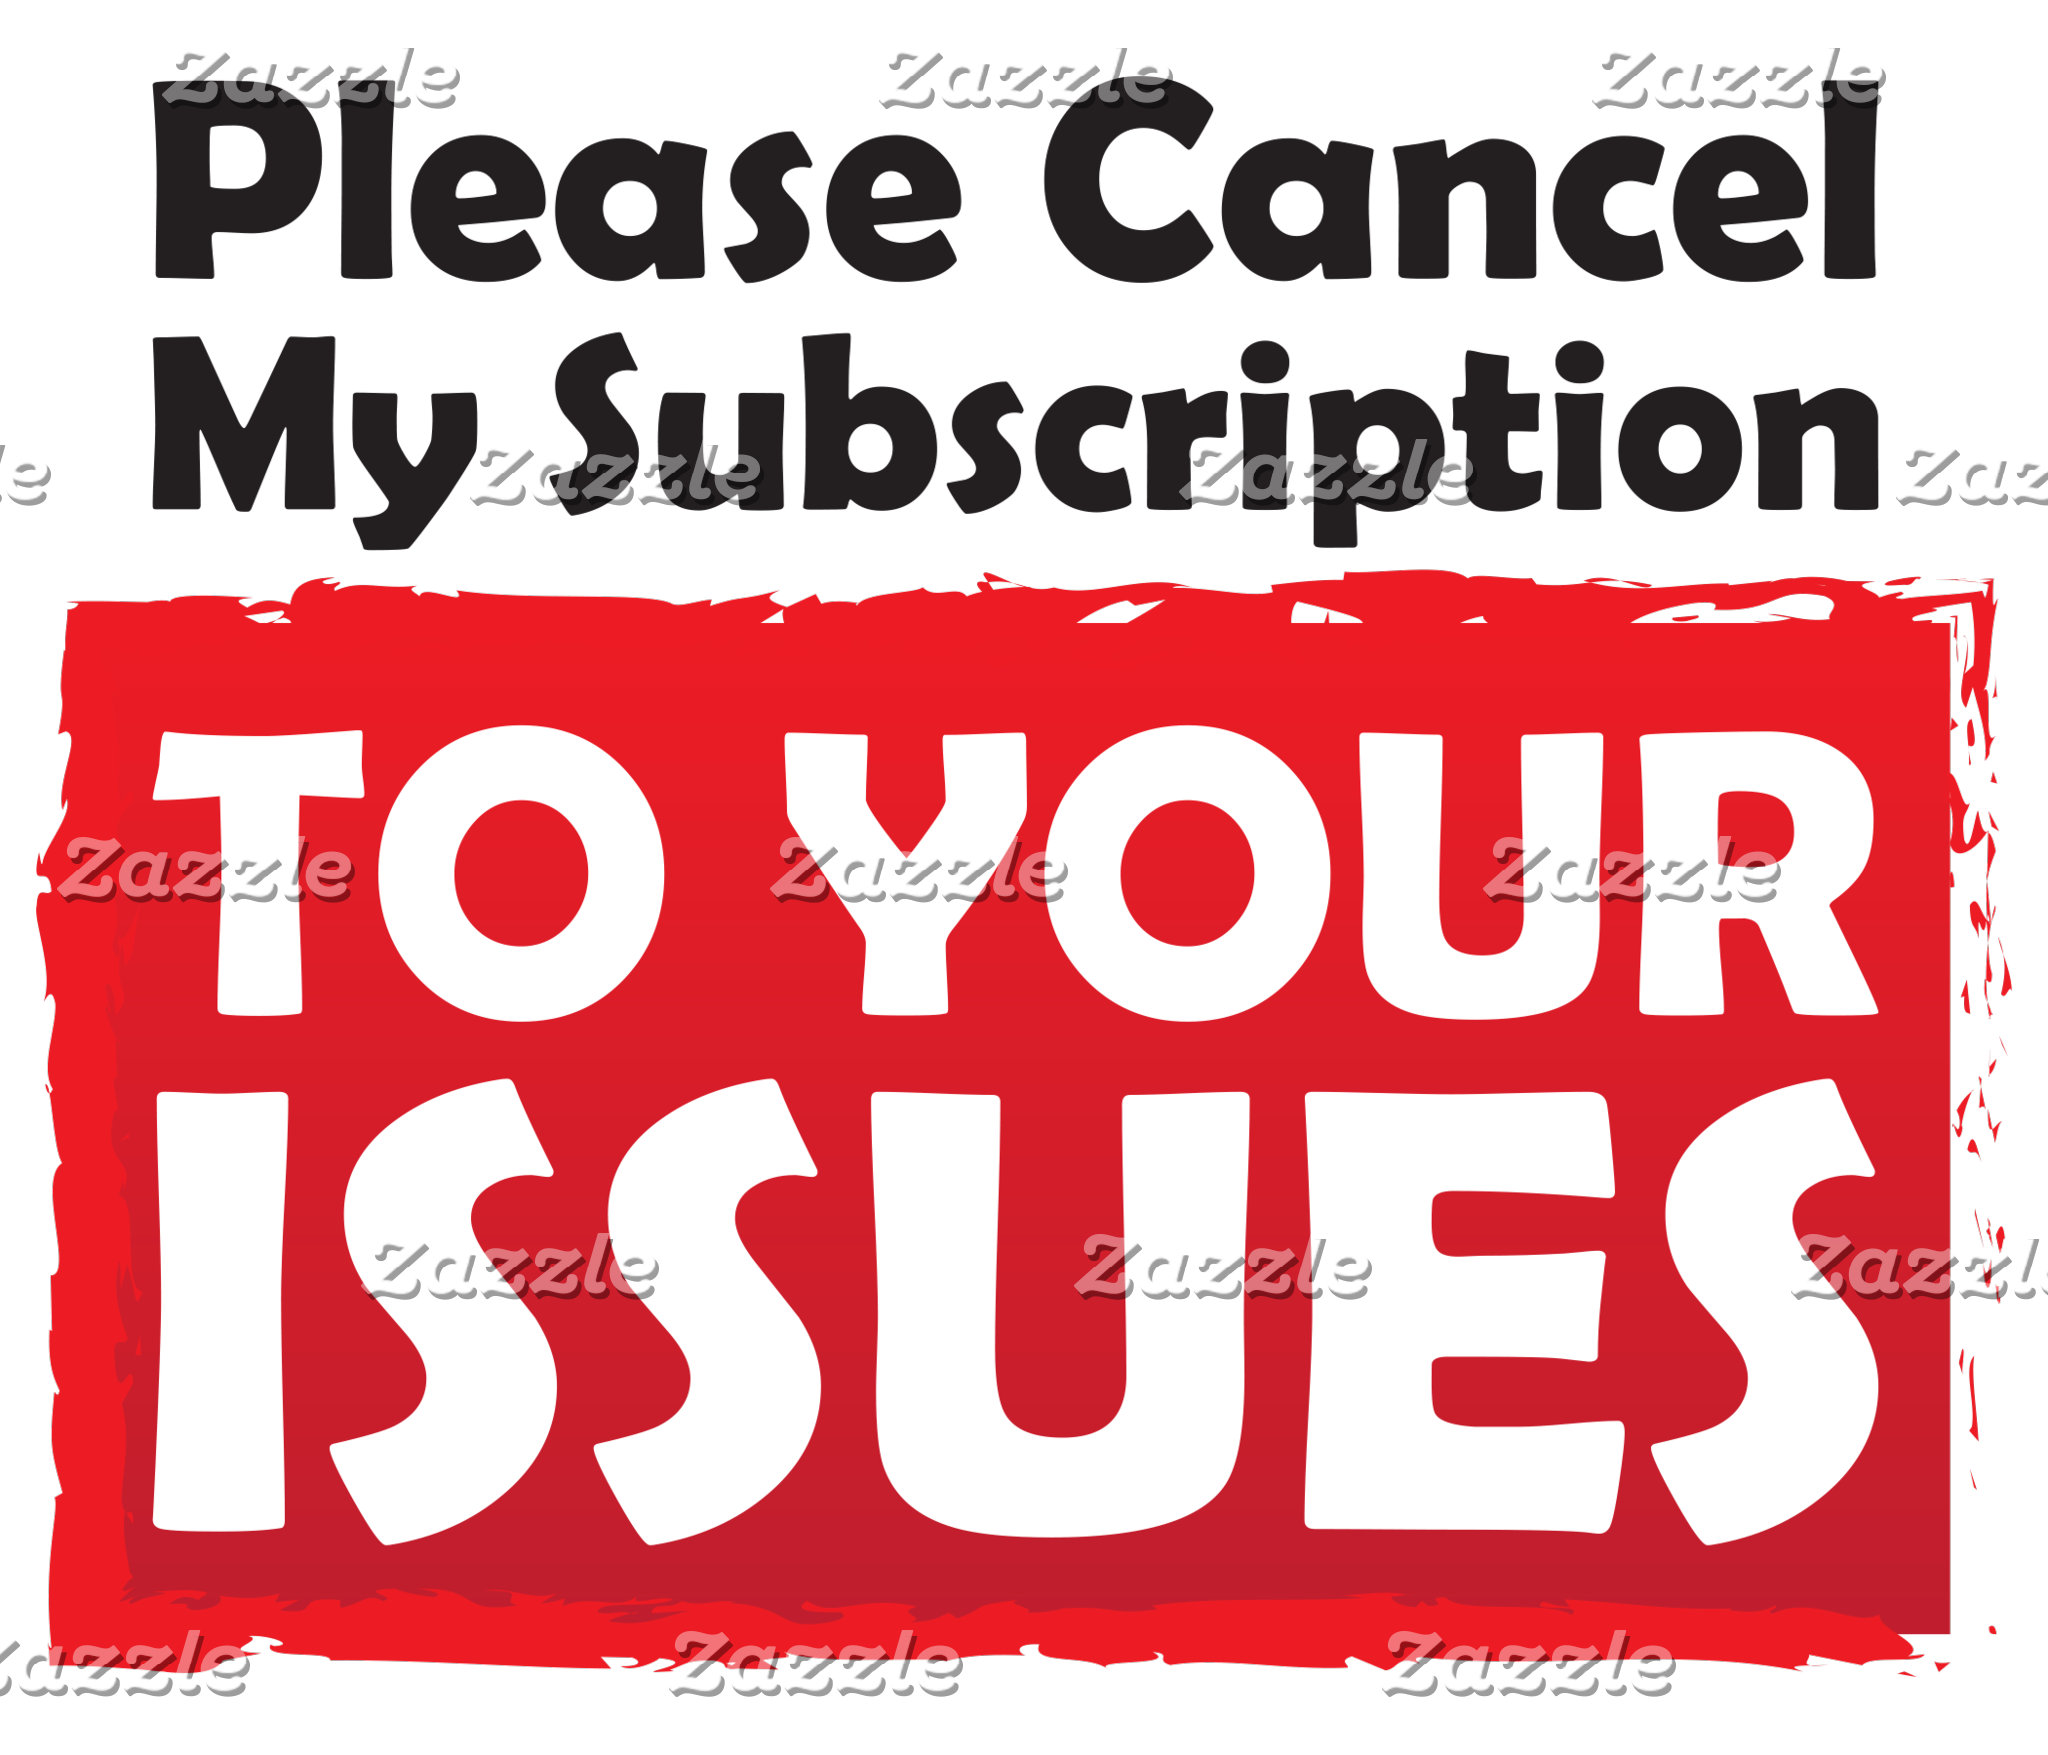 Cancel My Subscription